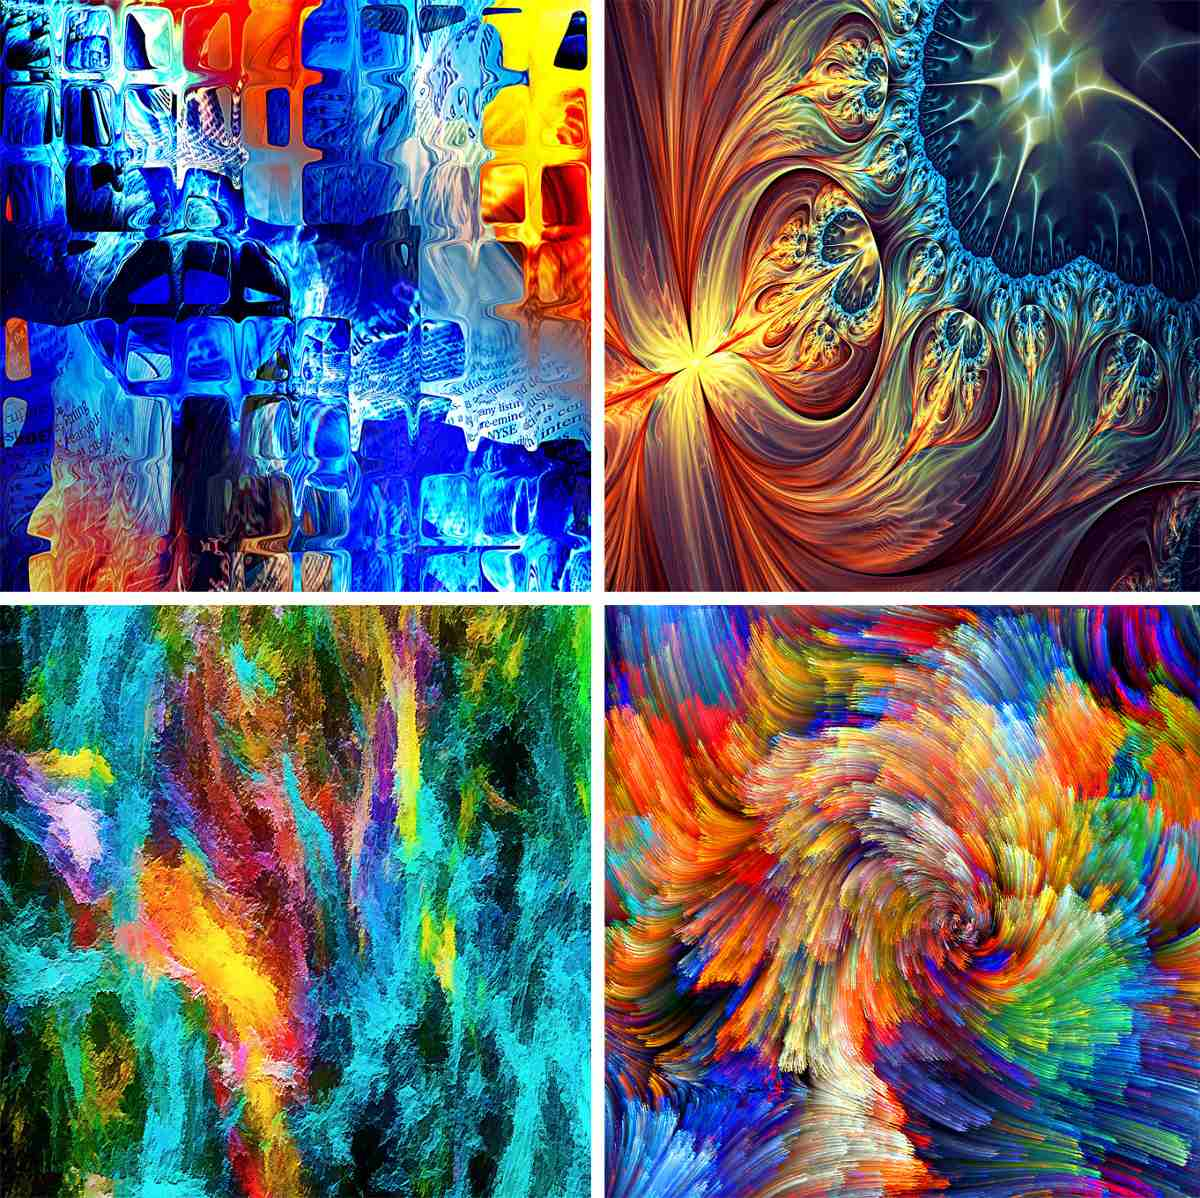 Abstractos lienzo lienzograf as 60x90 cuadros impresi n - Cuadros colores vivos ...